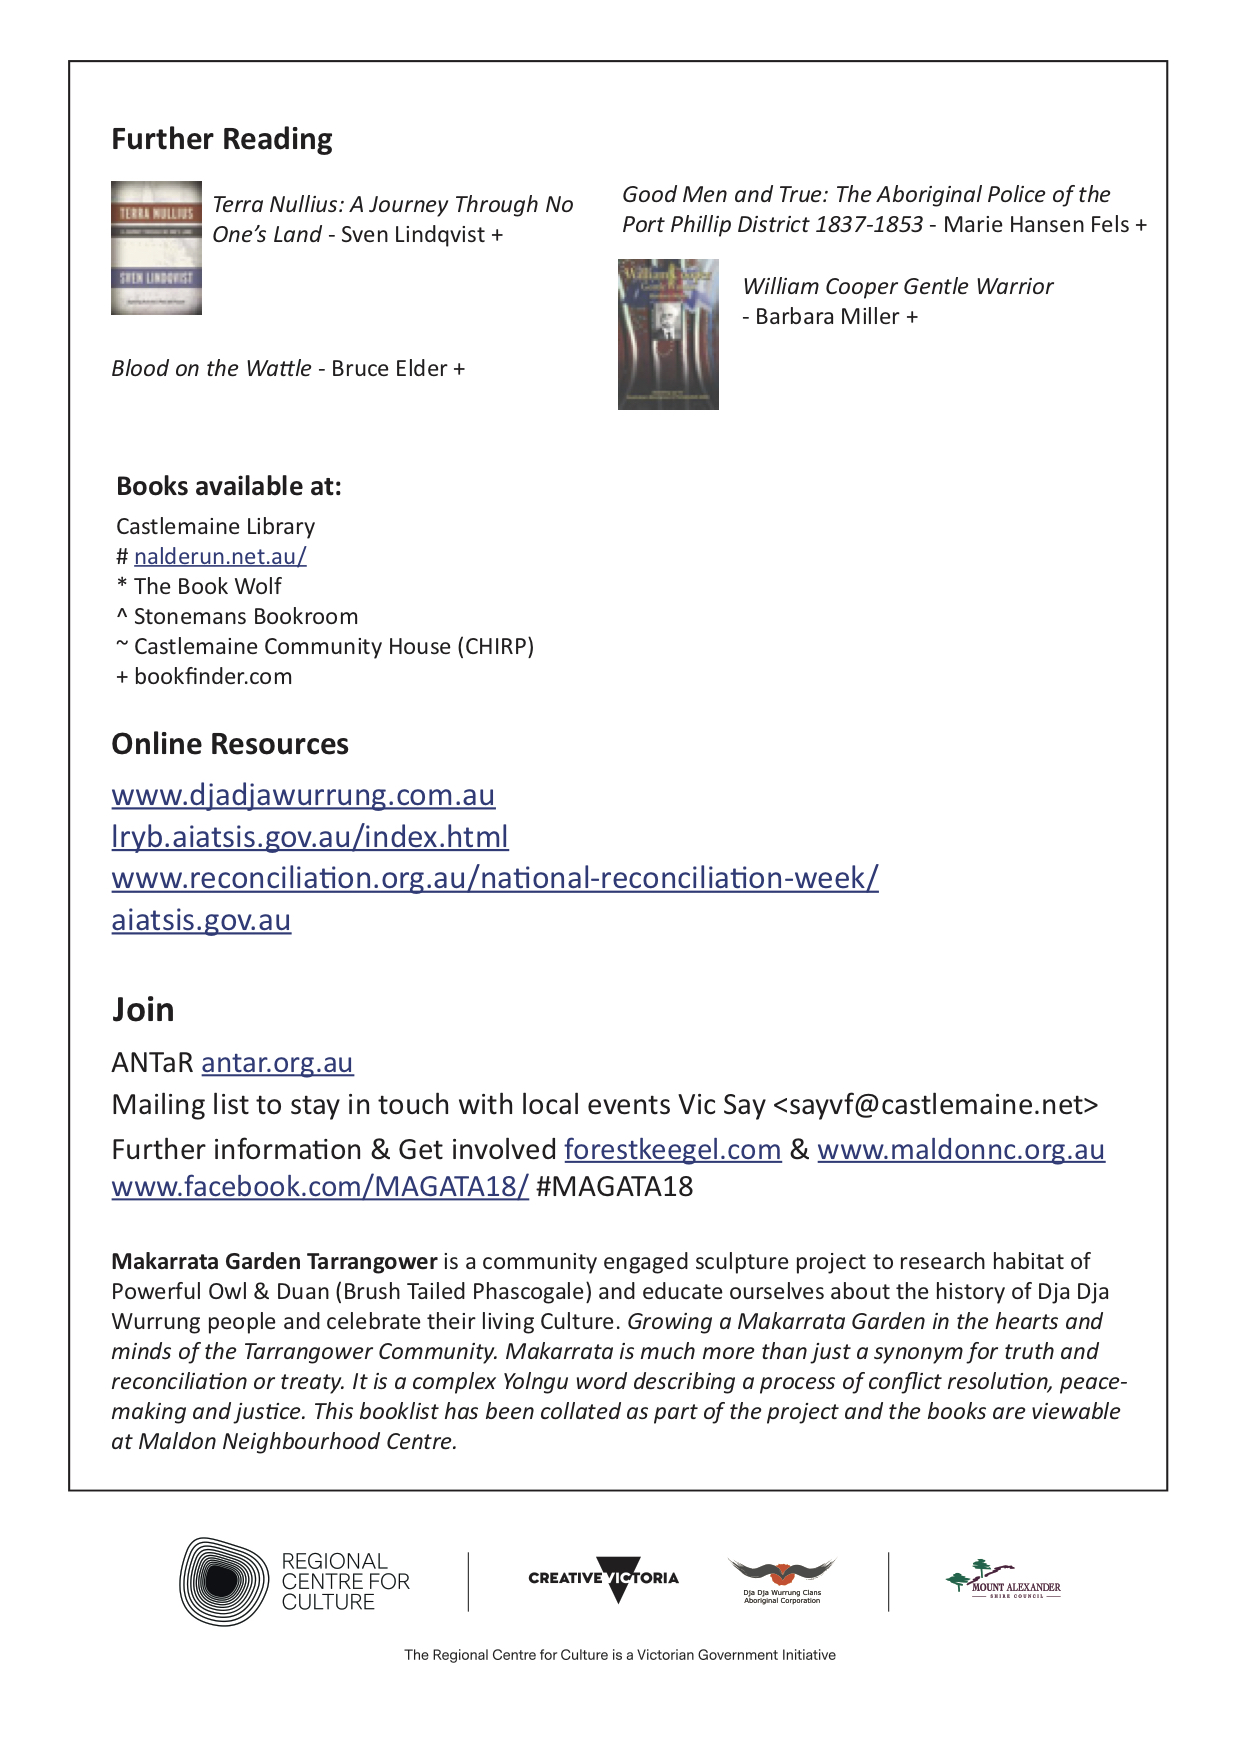 makarrata_v2 page2.jpg